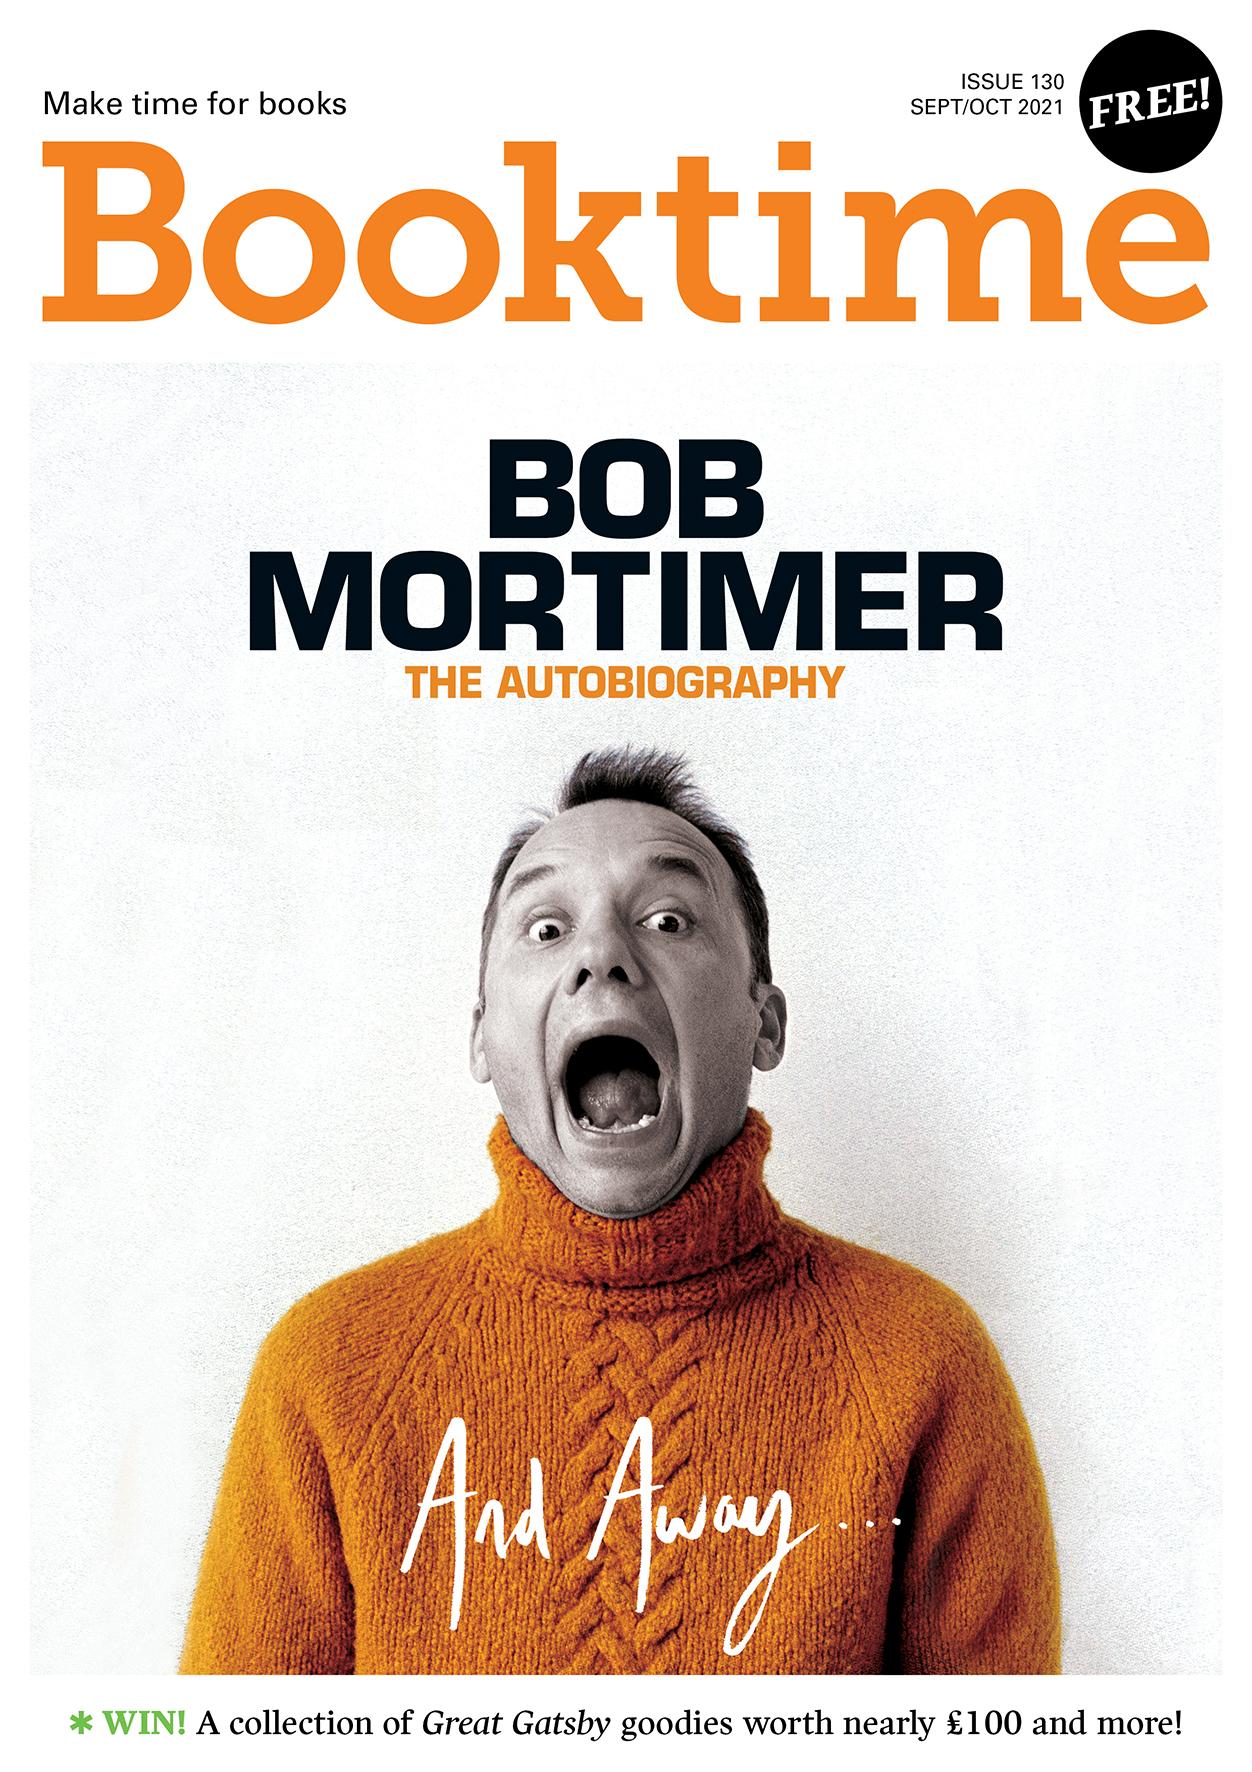 BOOKTIME SEPTEMBER OCTOBER 2021 COVER